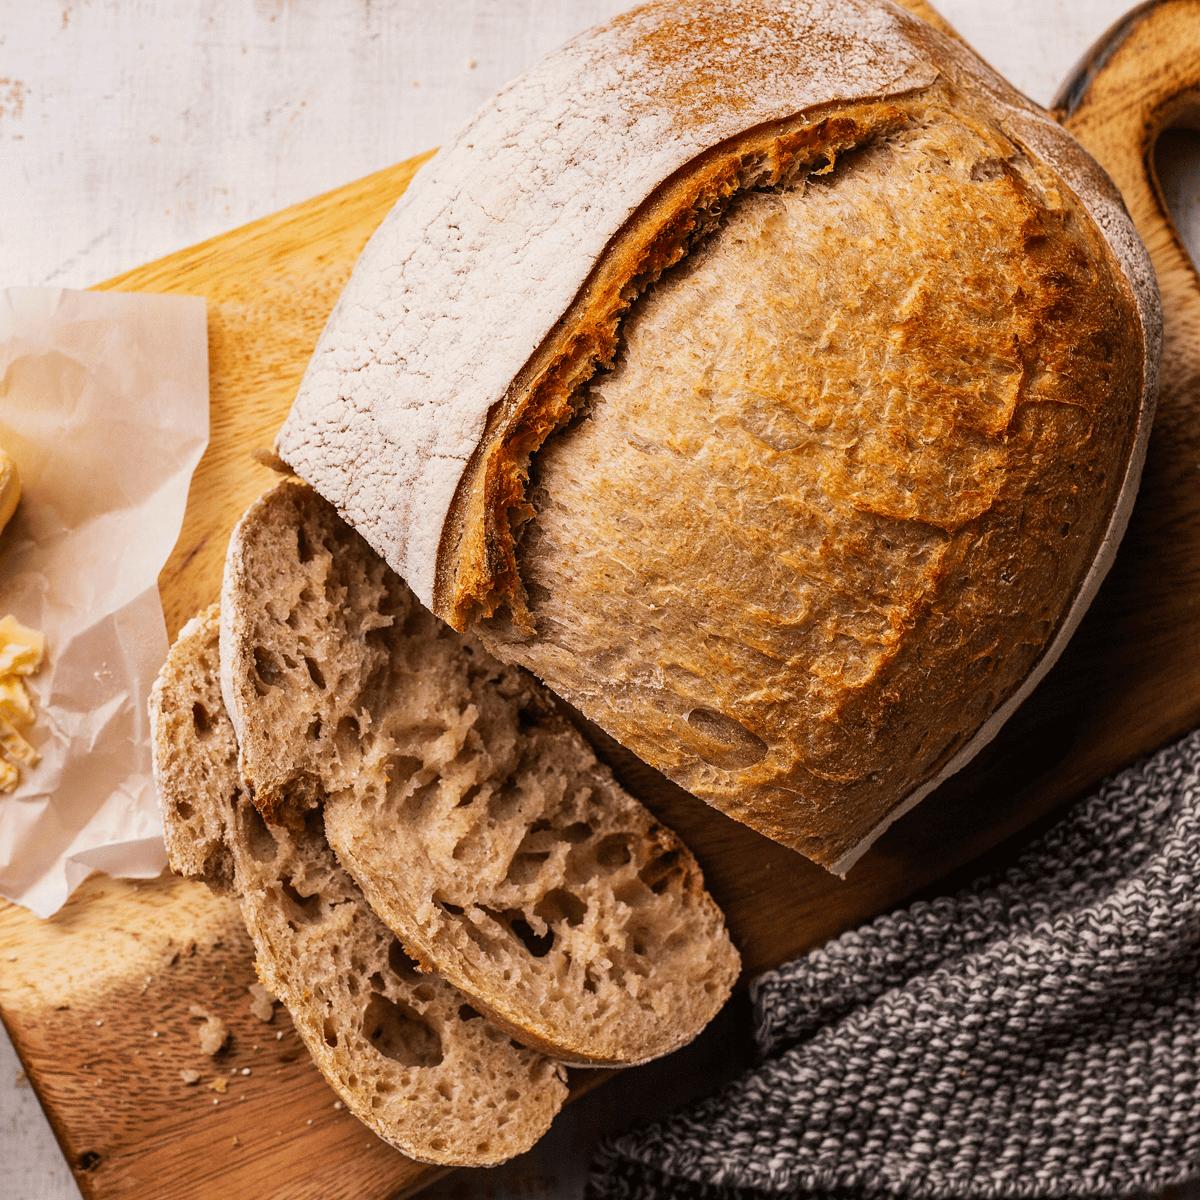 Ready-to-bake artisanal sourdough bread